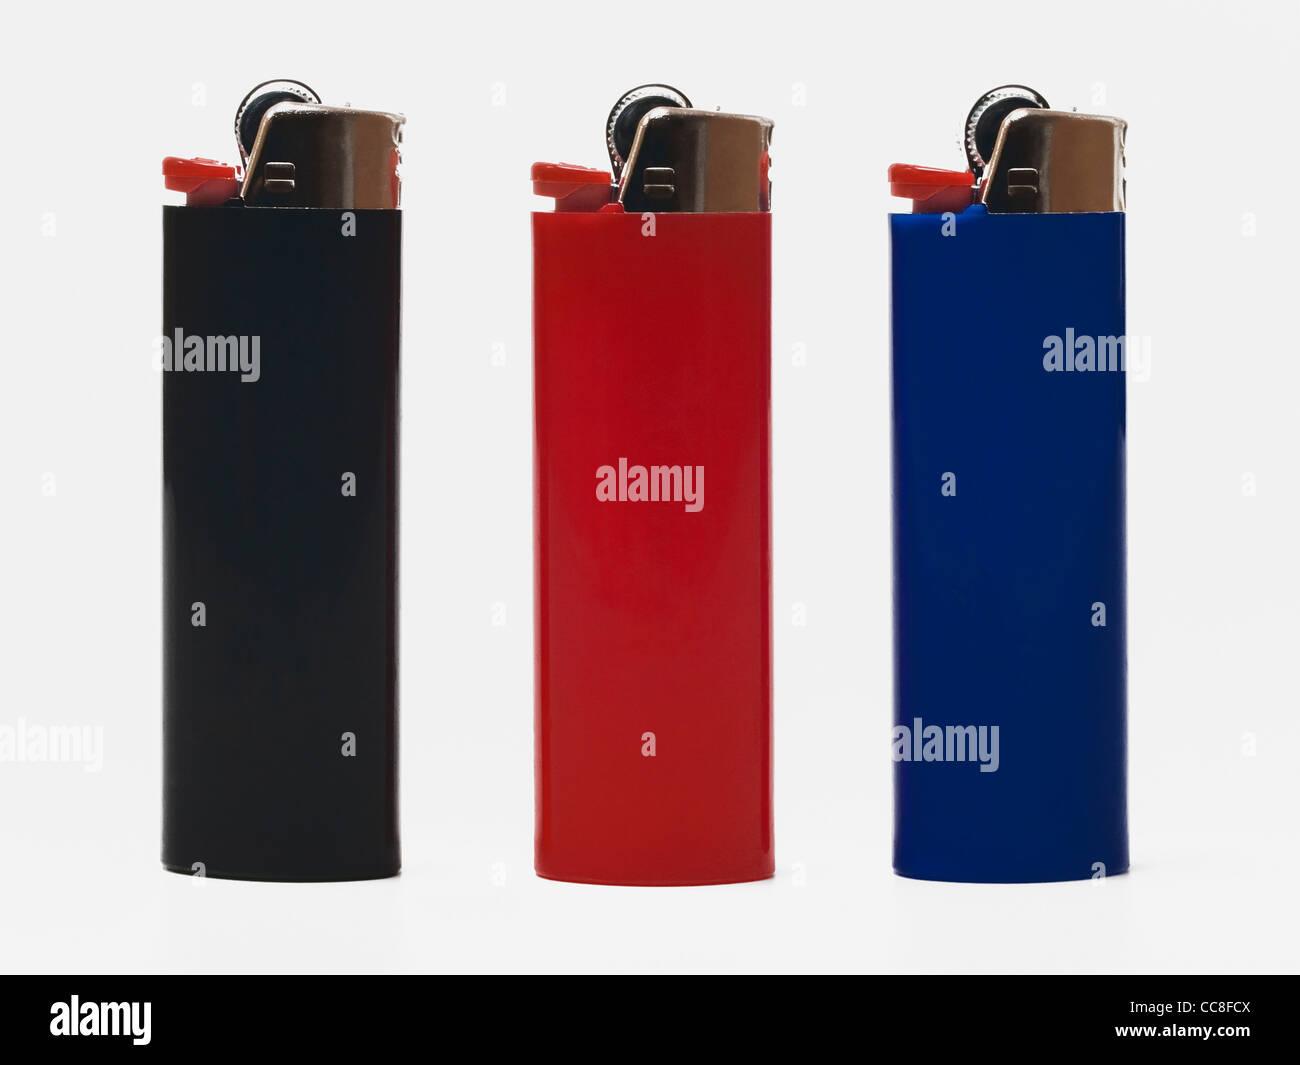 drei senkrecht stehende Feuerzeuge | three pocket lighters upright - Stock Image